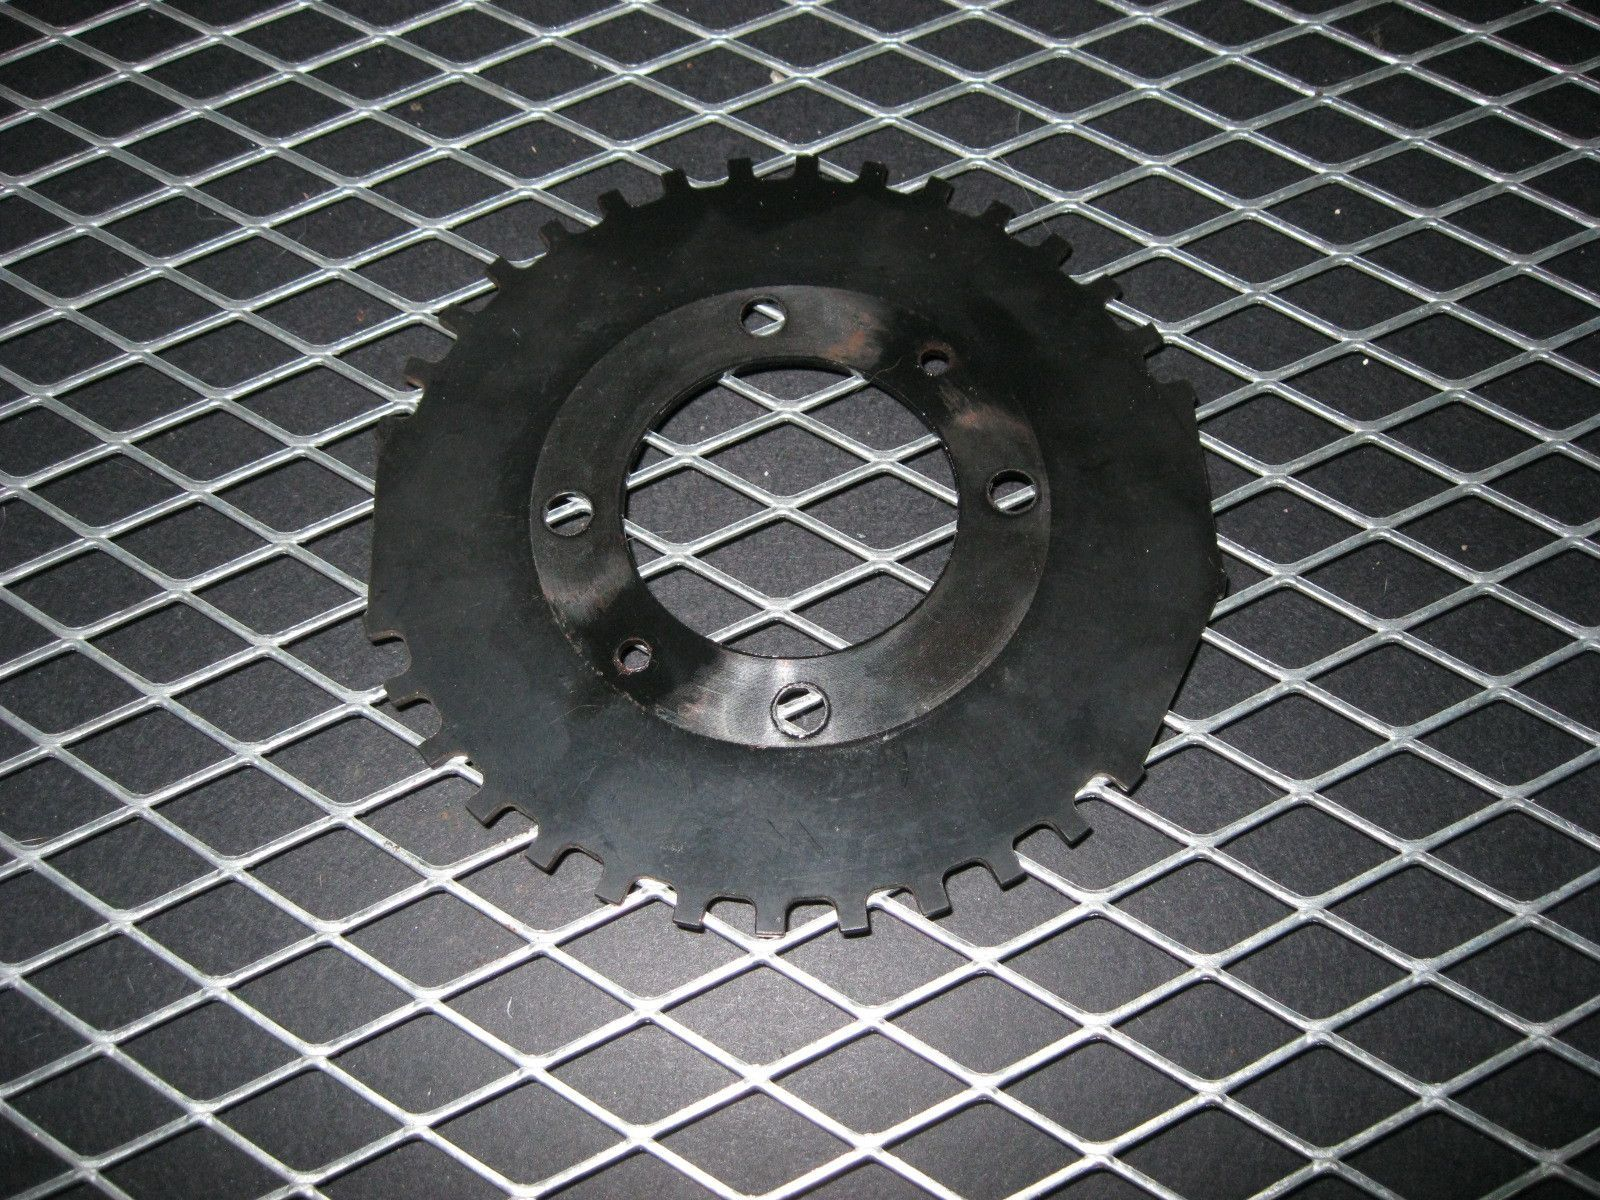 04 05 06 07 08 Mazda RX8 JDM 13B OEM Eccentric Shaft Pulley